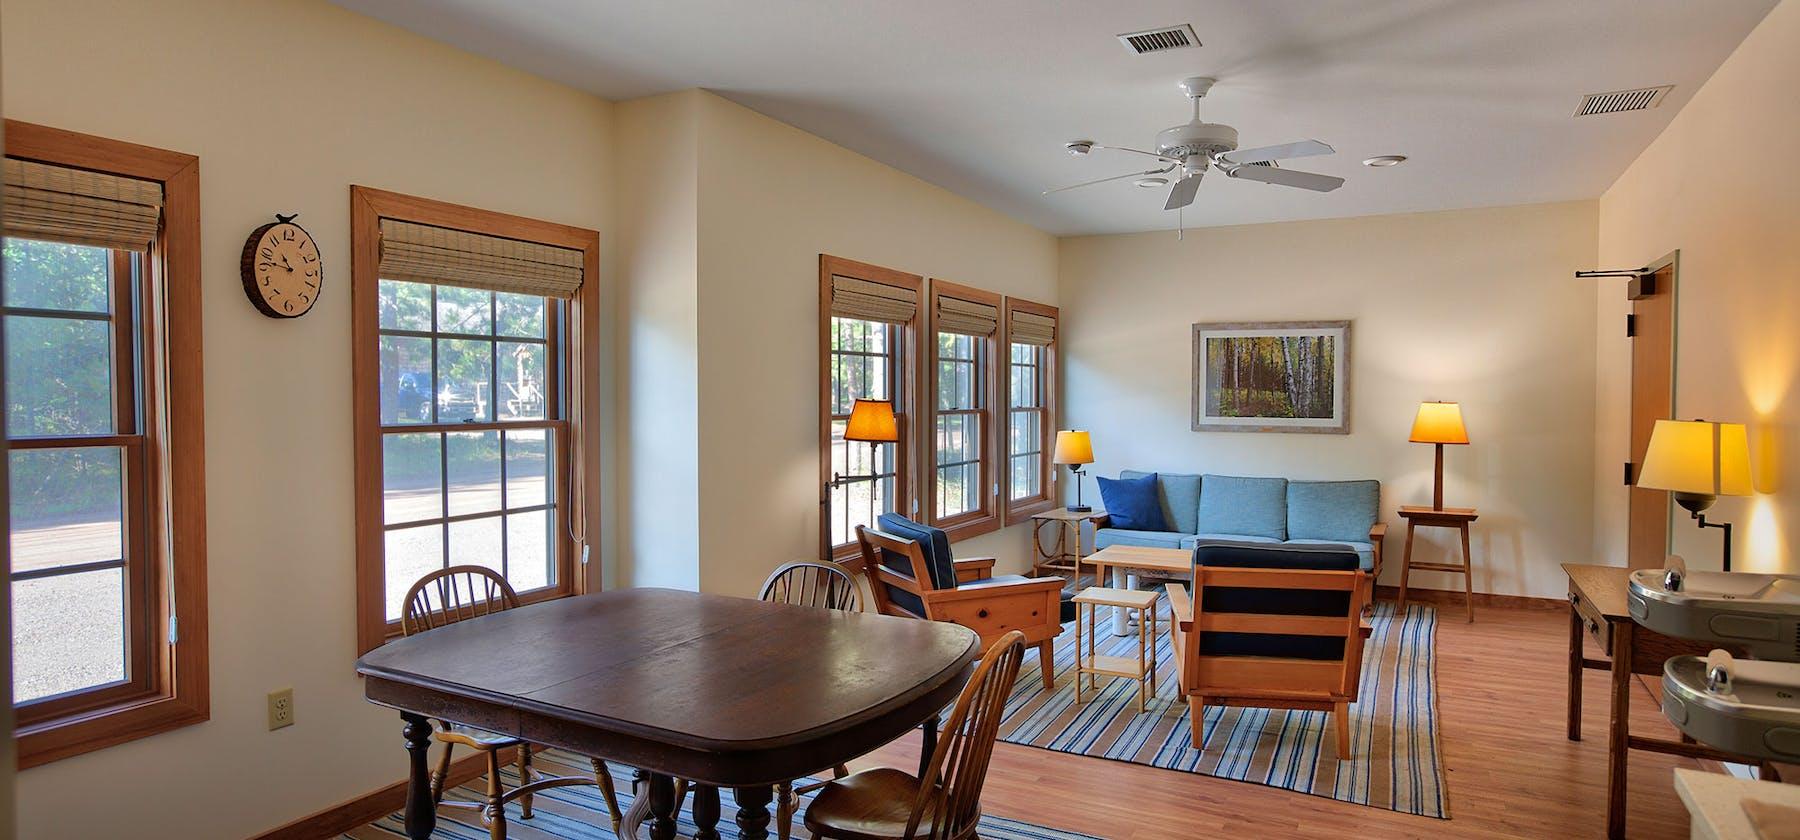 Huron Mountain Club dormitory interior